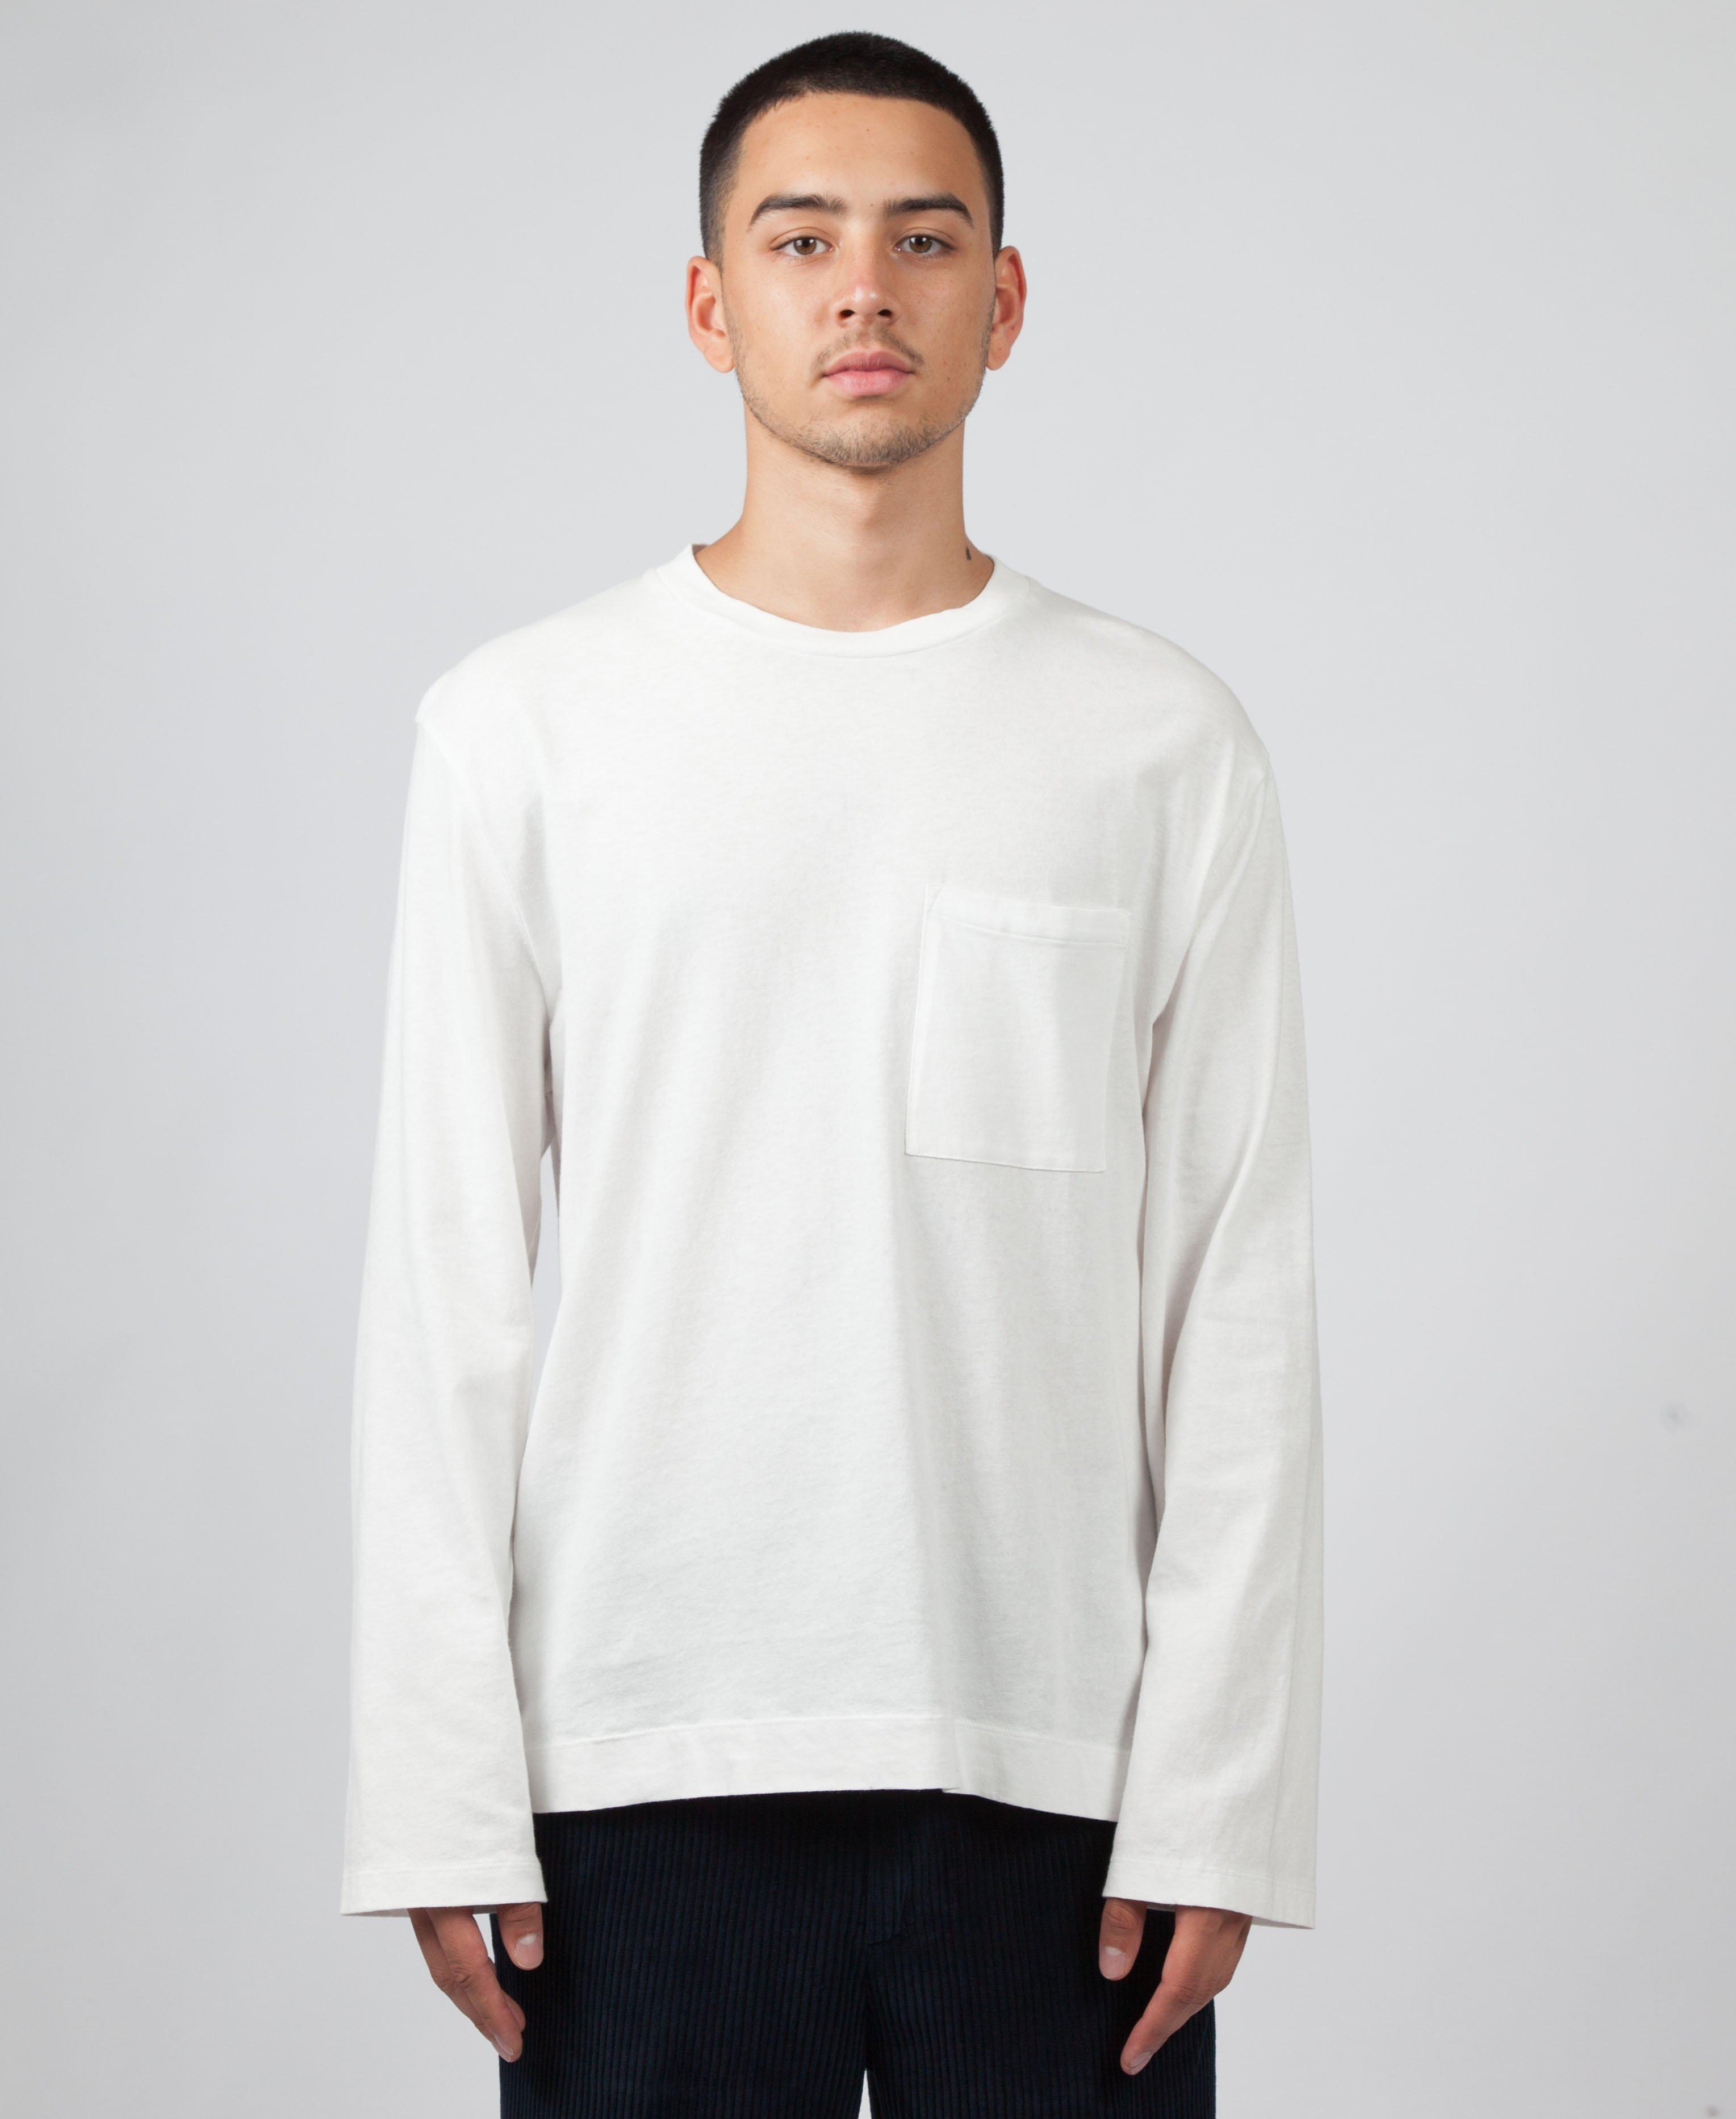 6d114efdaed1 Lyst - Our Legacy Box Longsleeve T-shirt in White for Men